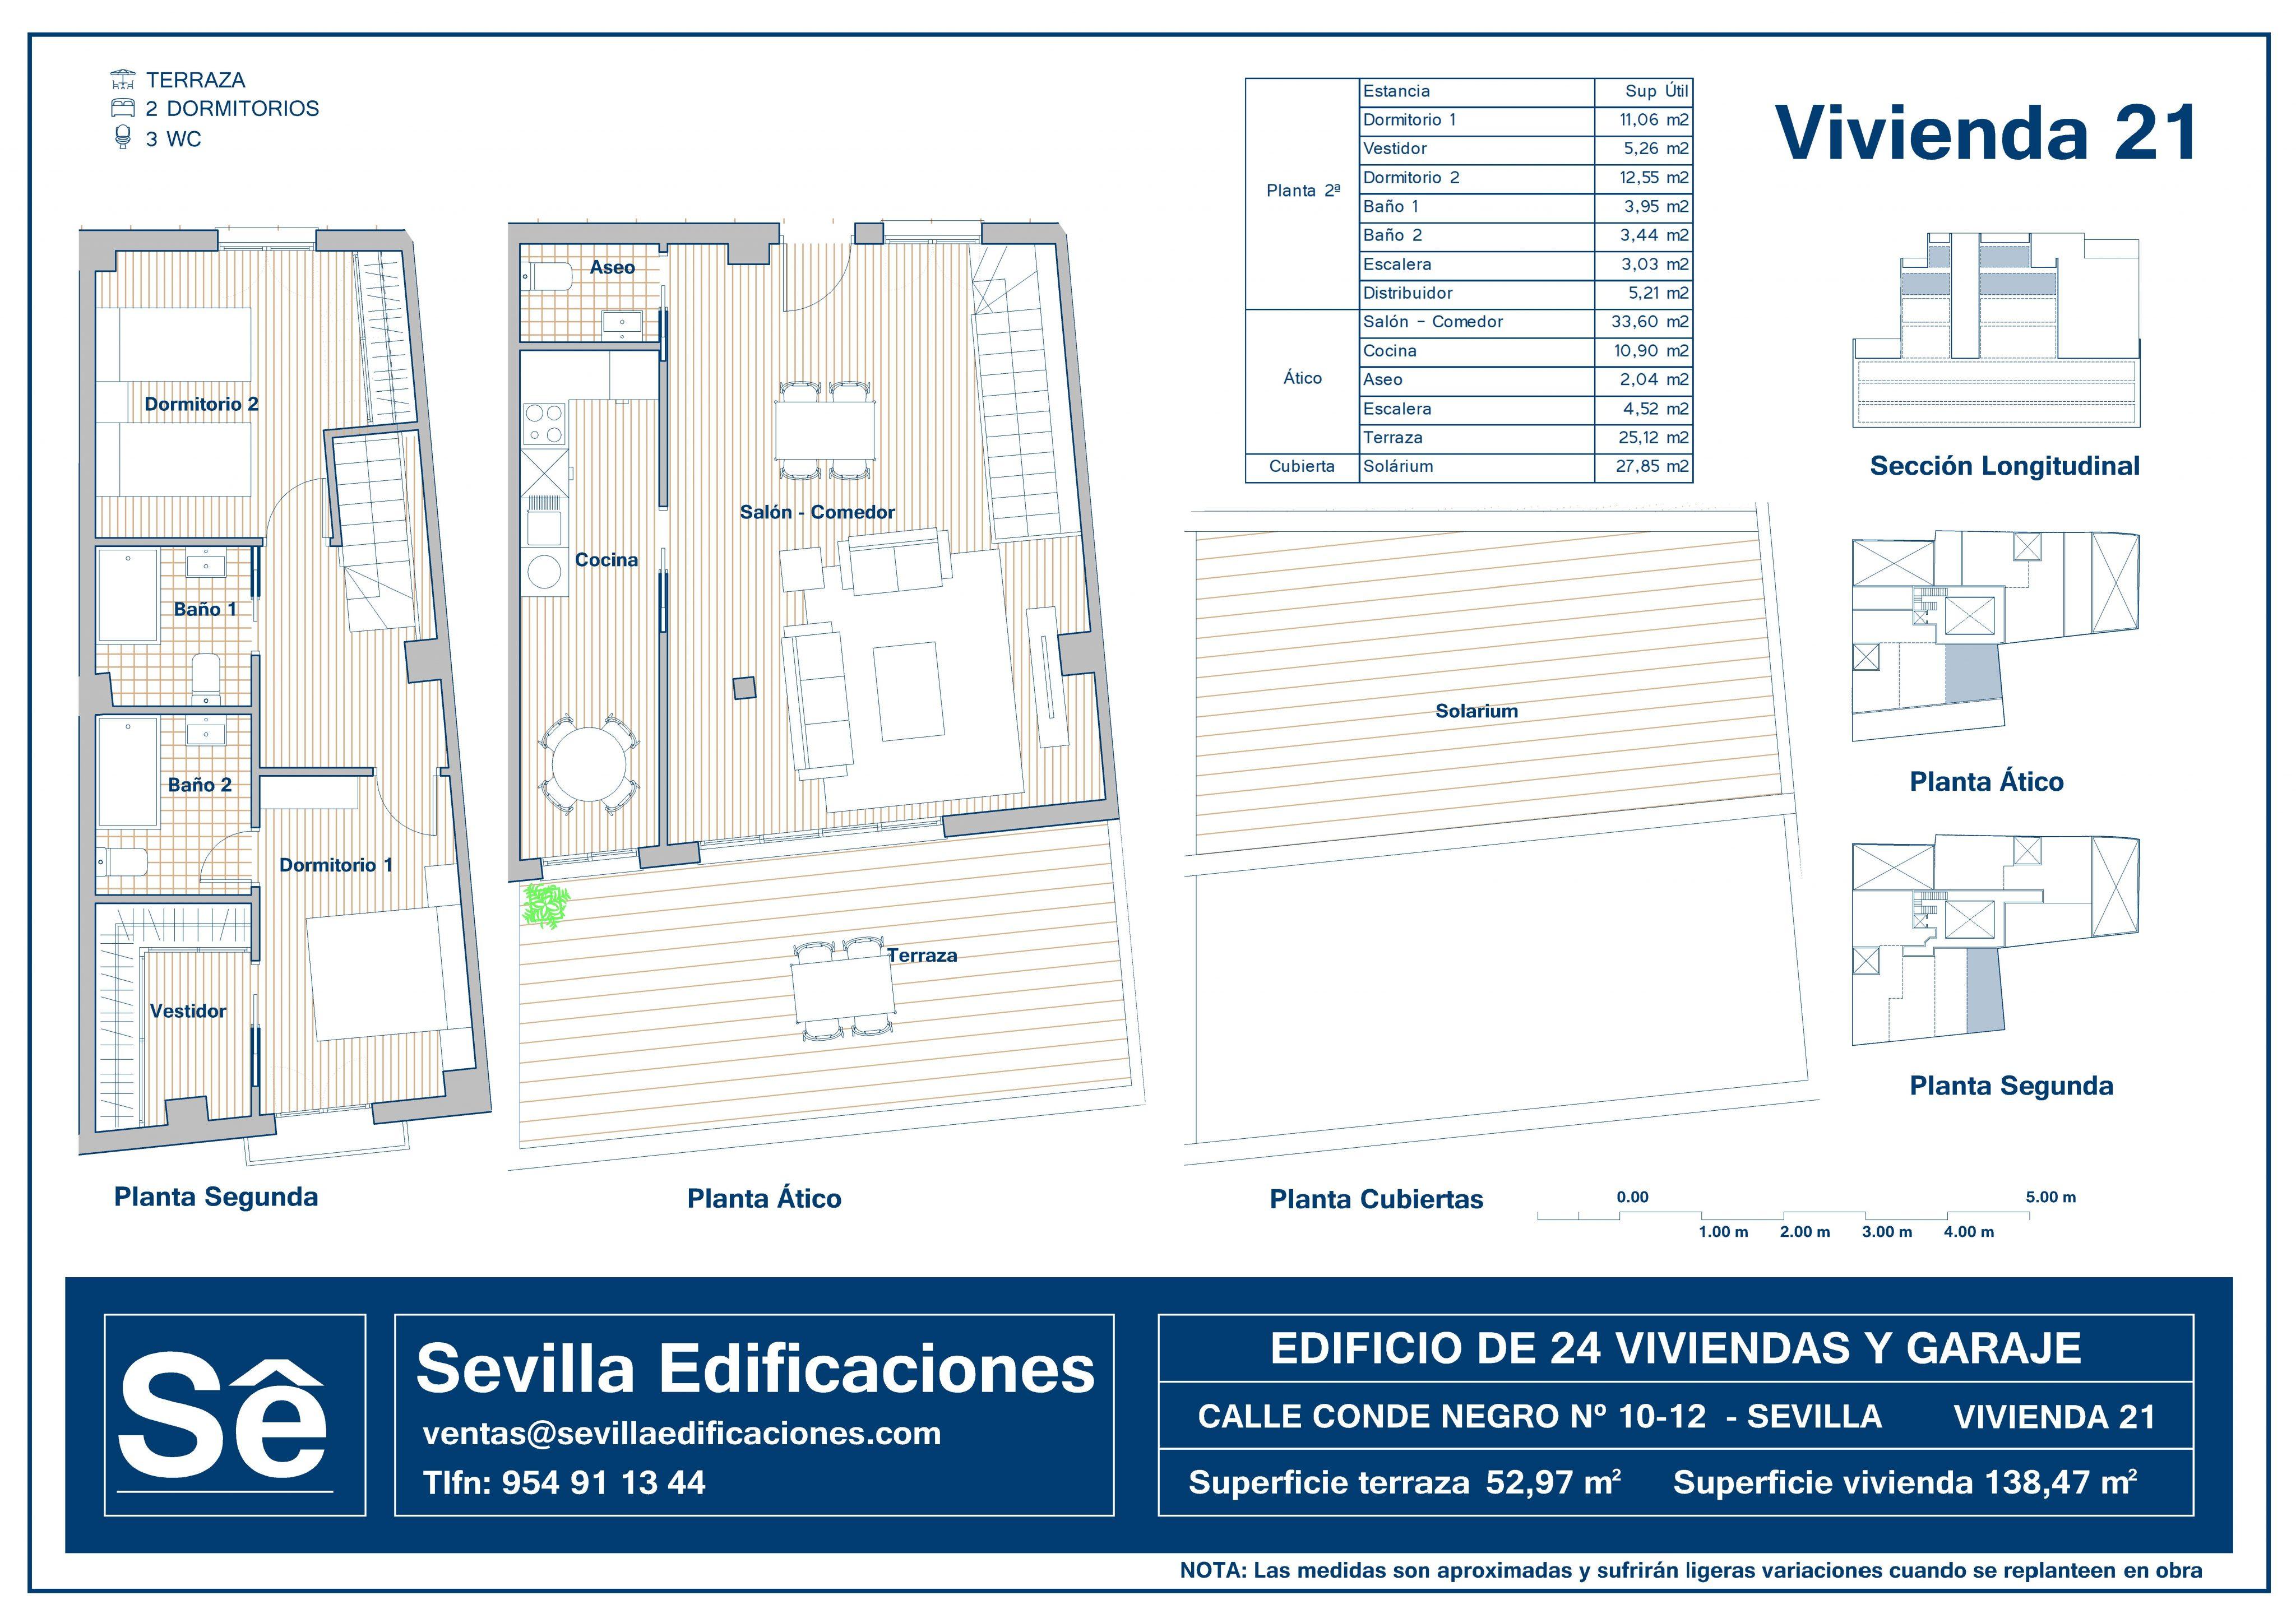 CONDENEGRO_VIVIENDA_21